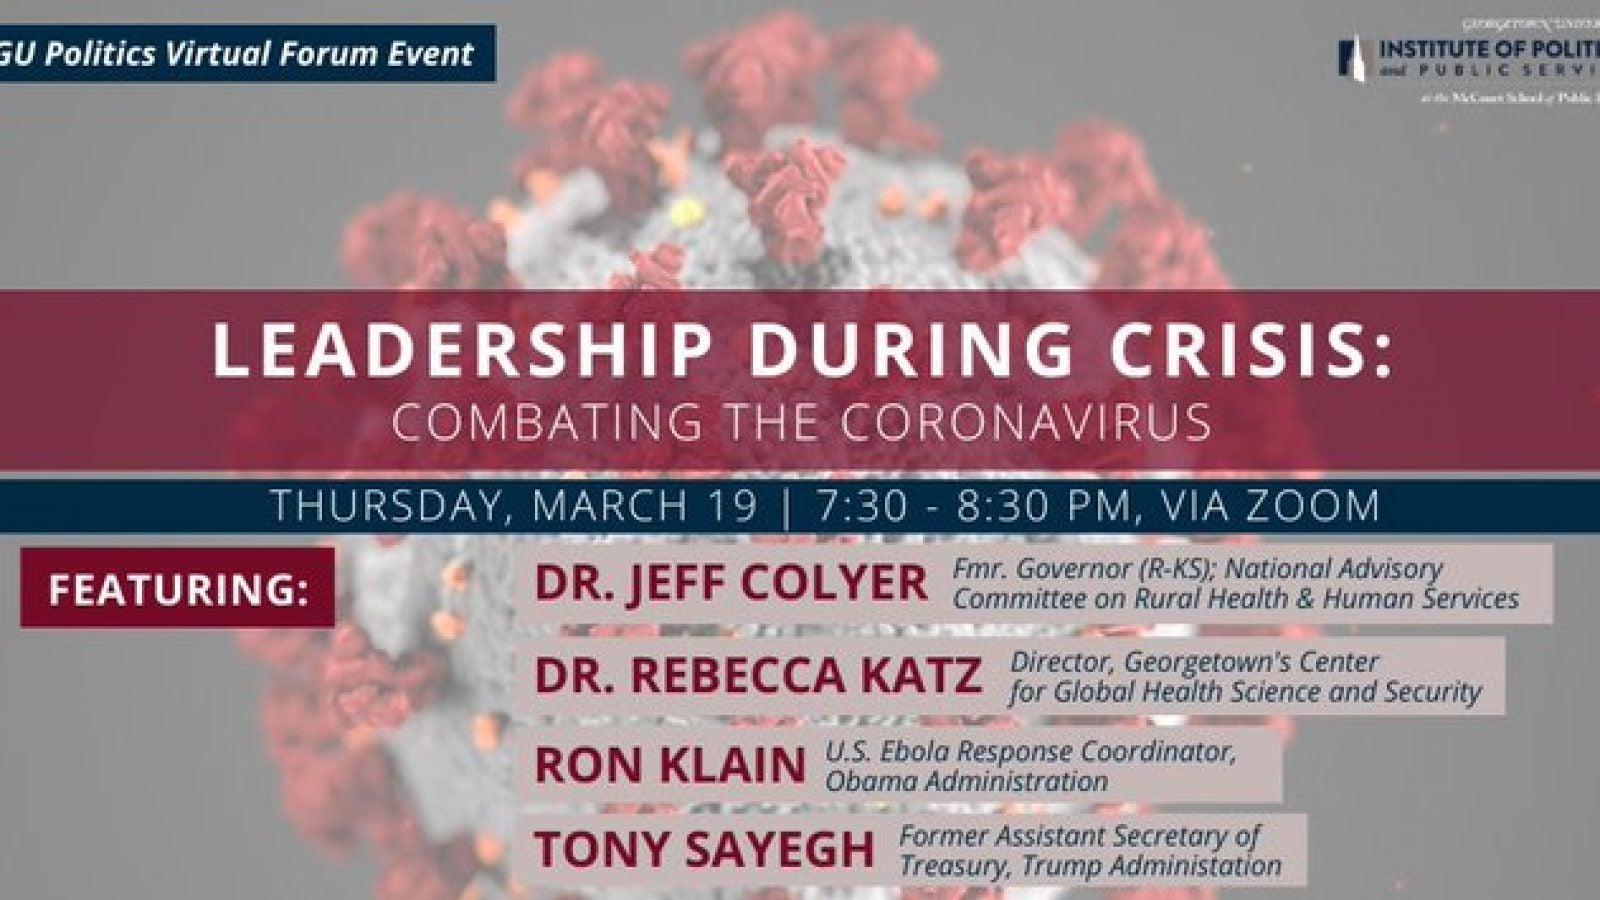 Leadership During Crisis: Combating the Coronavirus (graphic)